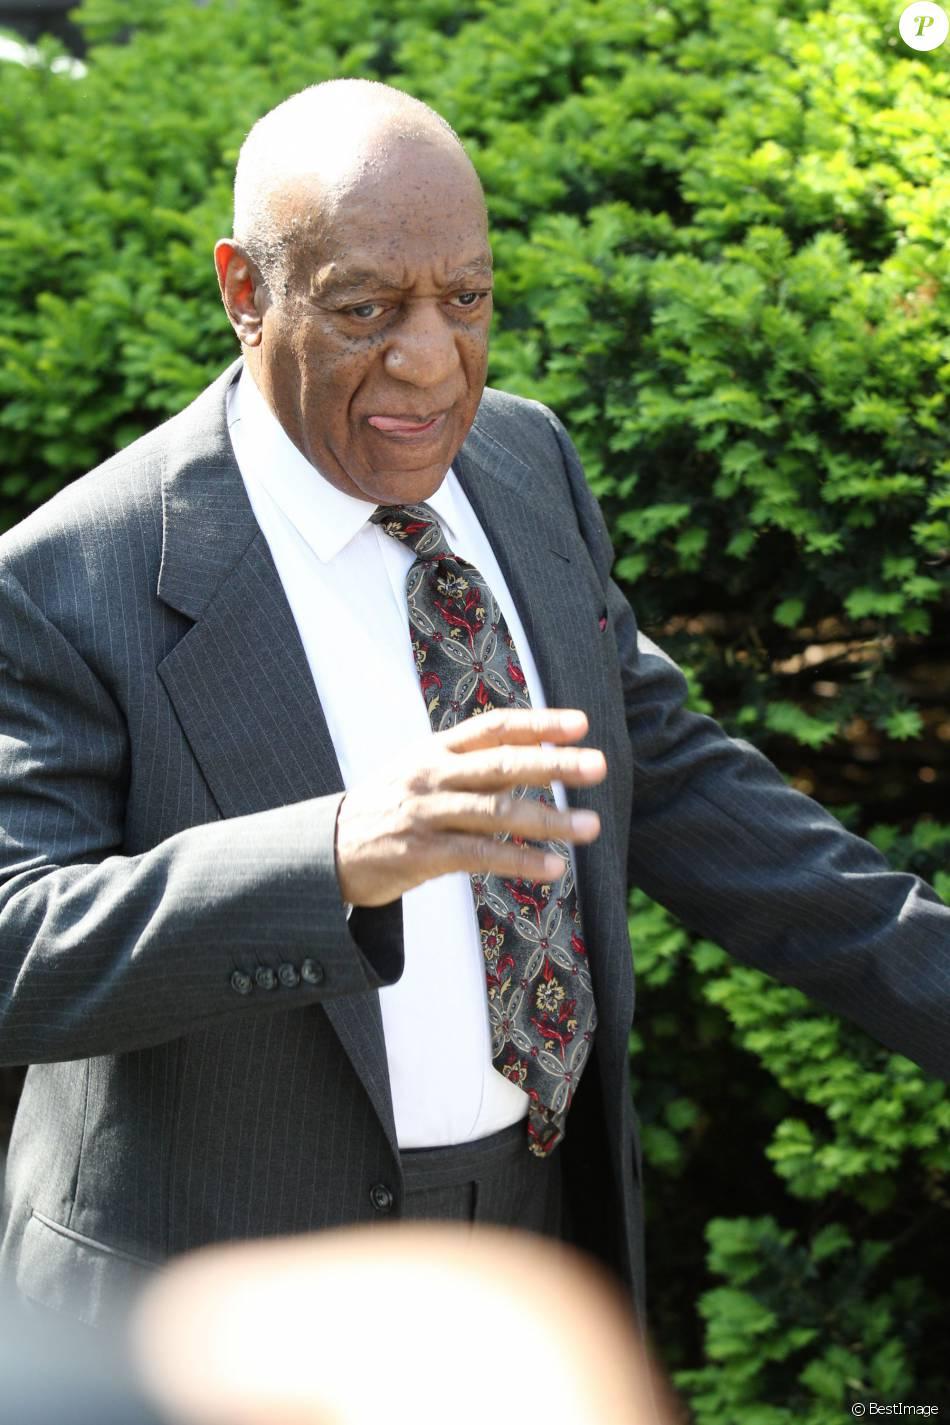 Bill Cosby, 78 ans, arrive à son audience préliminaire au tribunal de Norristown en Pennsylvanie le 24 mai 2016. Bill Cosby est entendu dans l'affaire Andrea Constand, Elle l'accuse de l'avoir droguée et d'avoir abusé d'elle ensuite.  78-year-old comedian Bill Cosby is seen at the At The Montgomery County Courthouse in Norristown, Pennsylvania for his Preliminary Hearing on May 24, 2016. Cosby is charged with aggravated indecent assault for allegedly drugging and sexually assaulting Andrea Constand in January 2004 at his Elkins Park, Pennsylvania mansion.24/05/2016 - Norristown